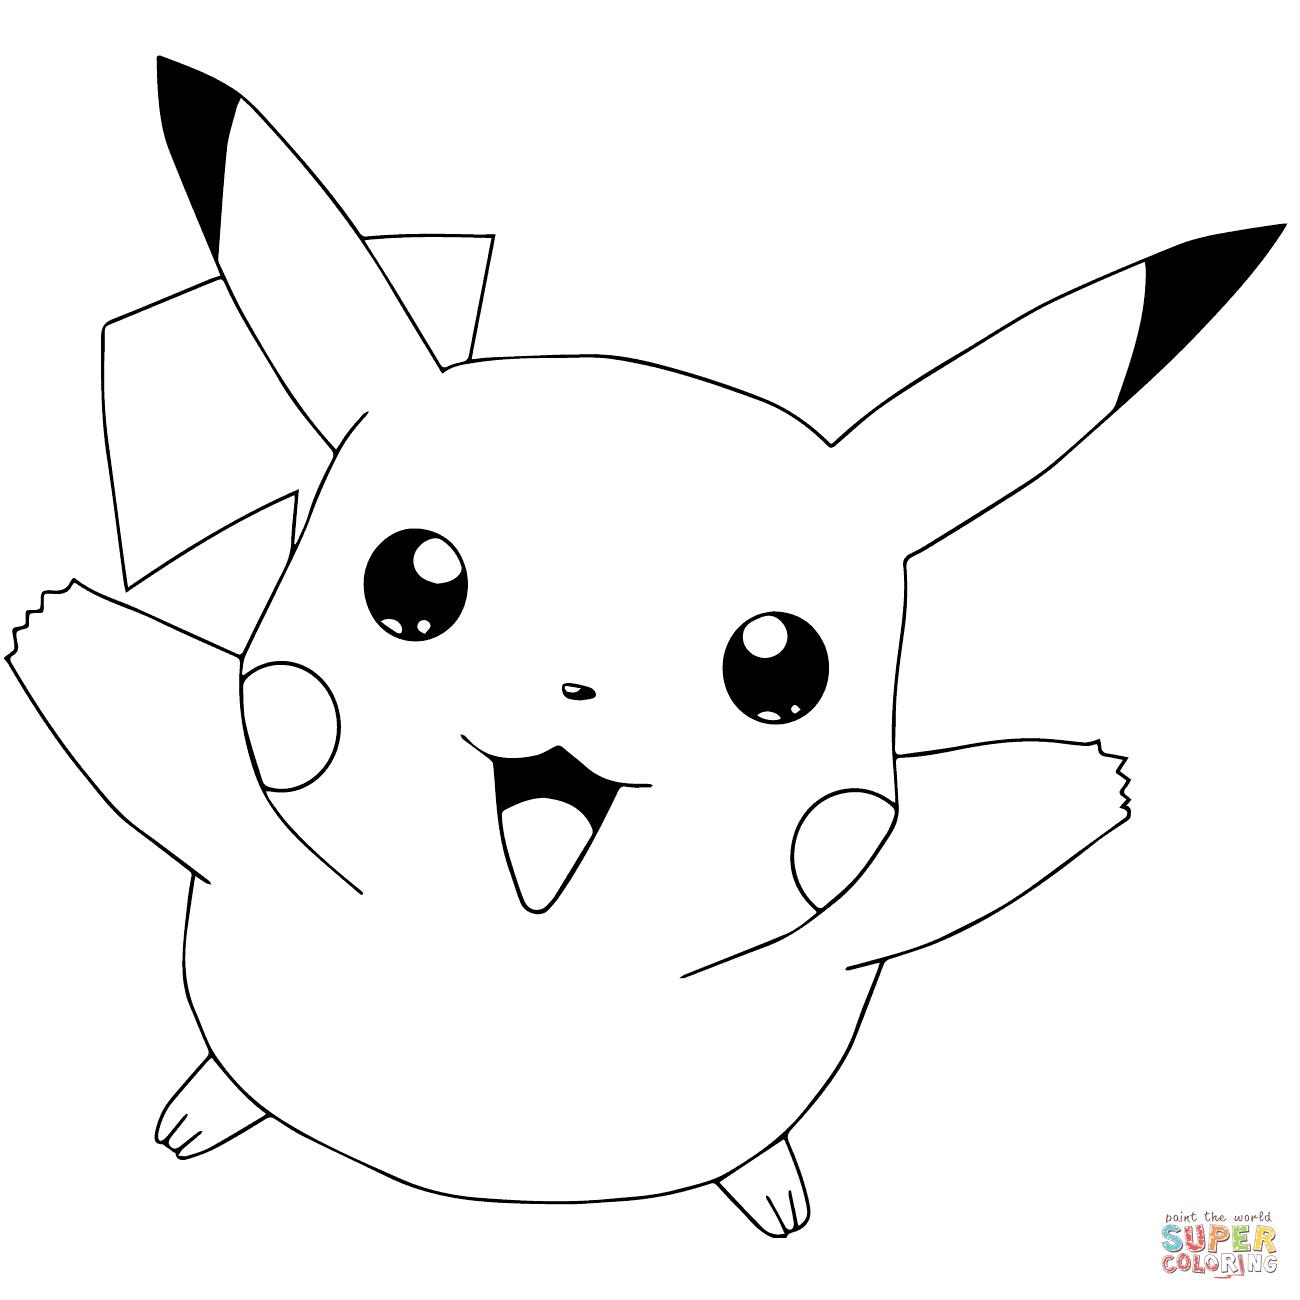 Pokémon Go Pikachu Flying Coloring Page | Free Printable Coloring Pages - Free Printable Coloring Pages Pokemon Black White